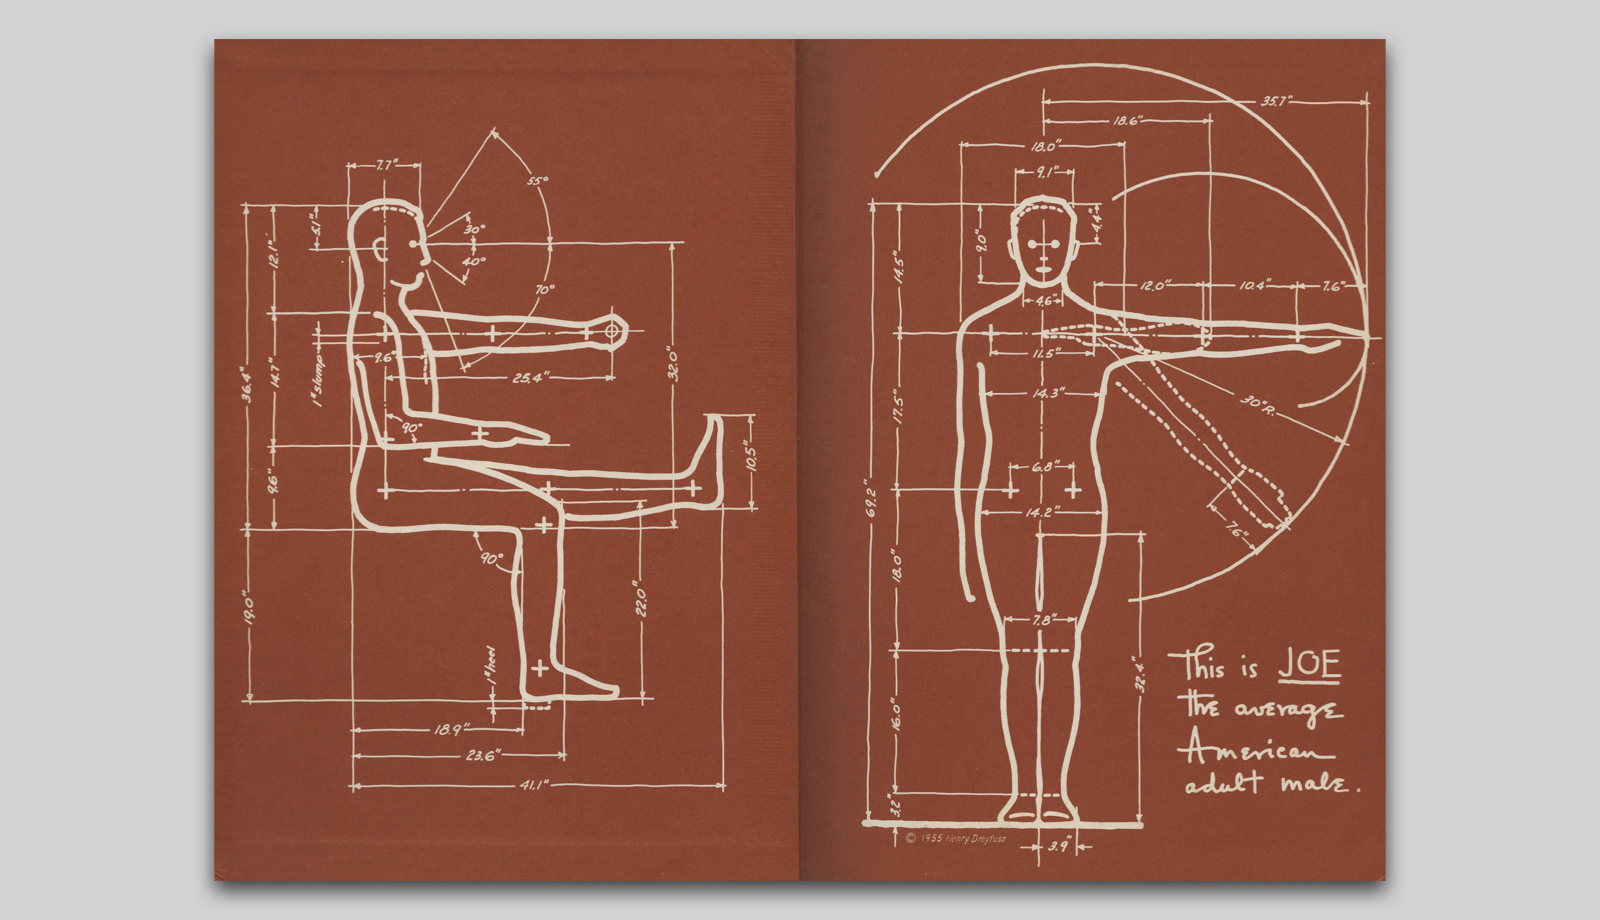 190711_Designkritik_ReneSpitz_WDR3-Mosaik_GeschichteDerInfografik